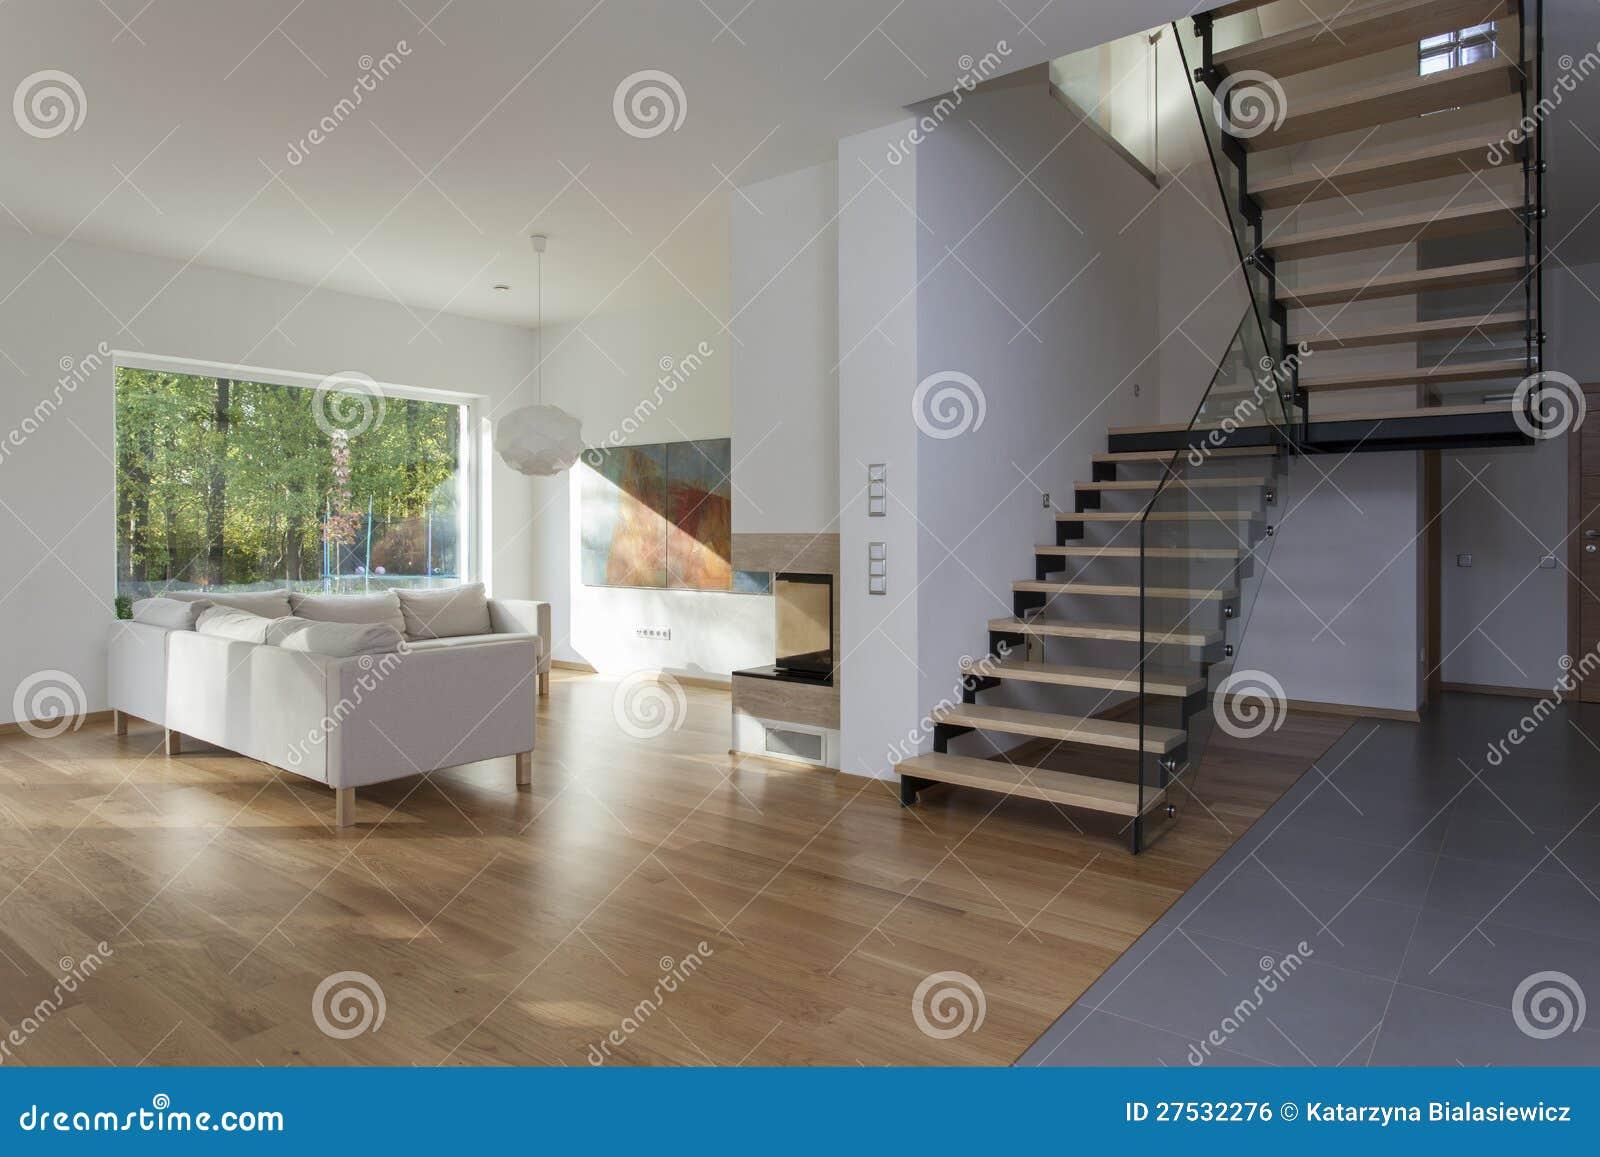 Sala de estar escaleras imagen de archivo libre de for Escaleras de sala